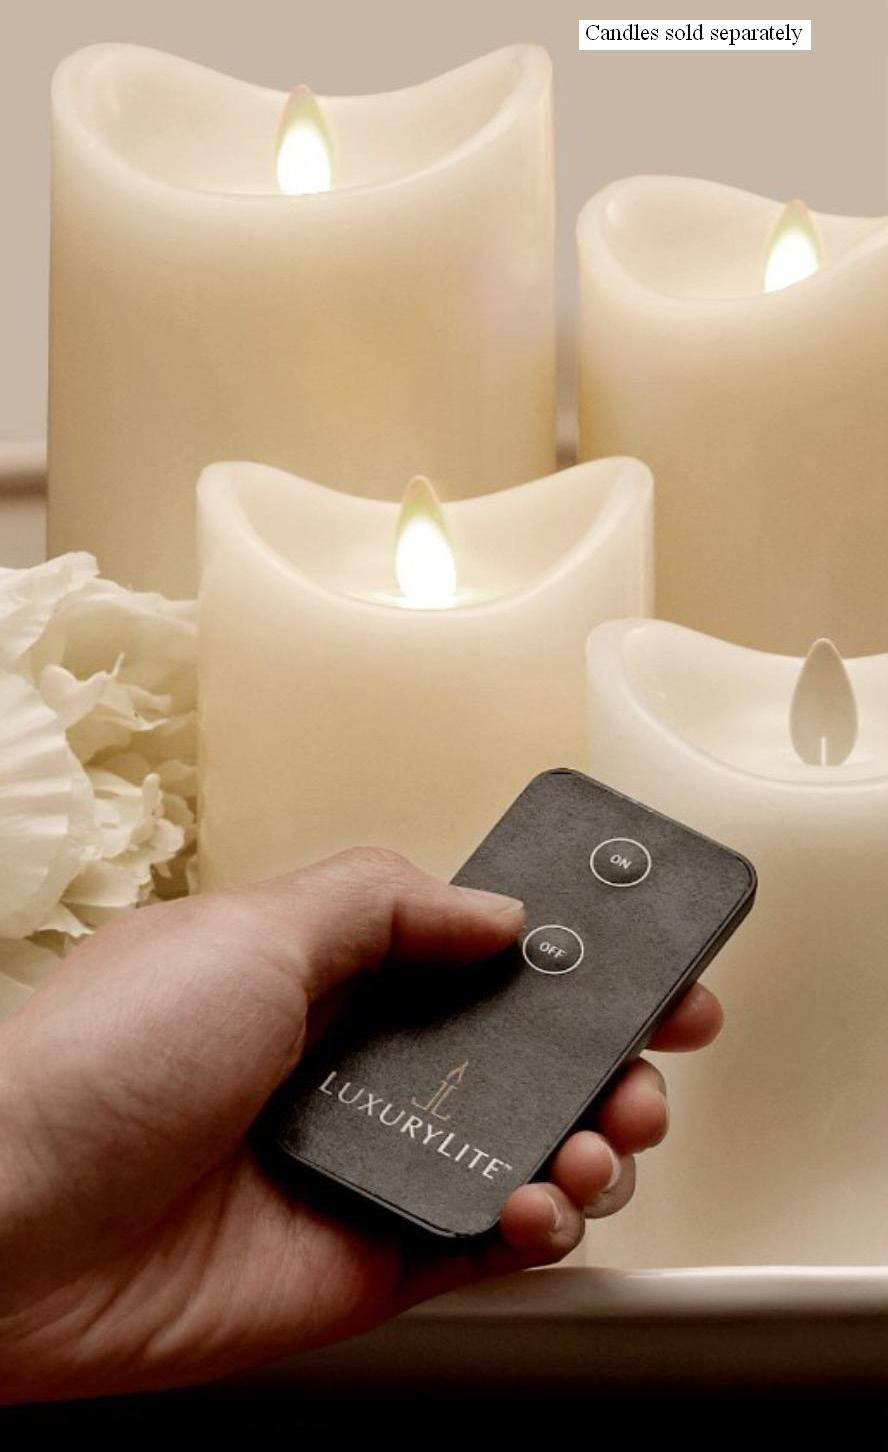 Ganz luxurylite home decor hand held remote control for for Home decorators remote